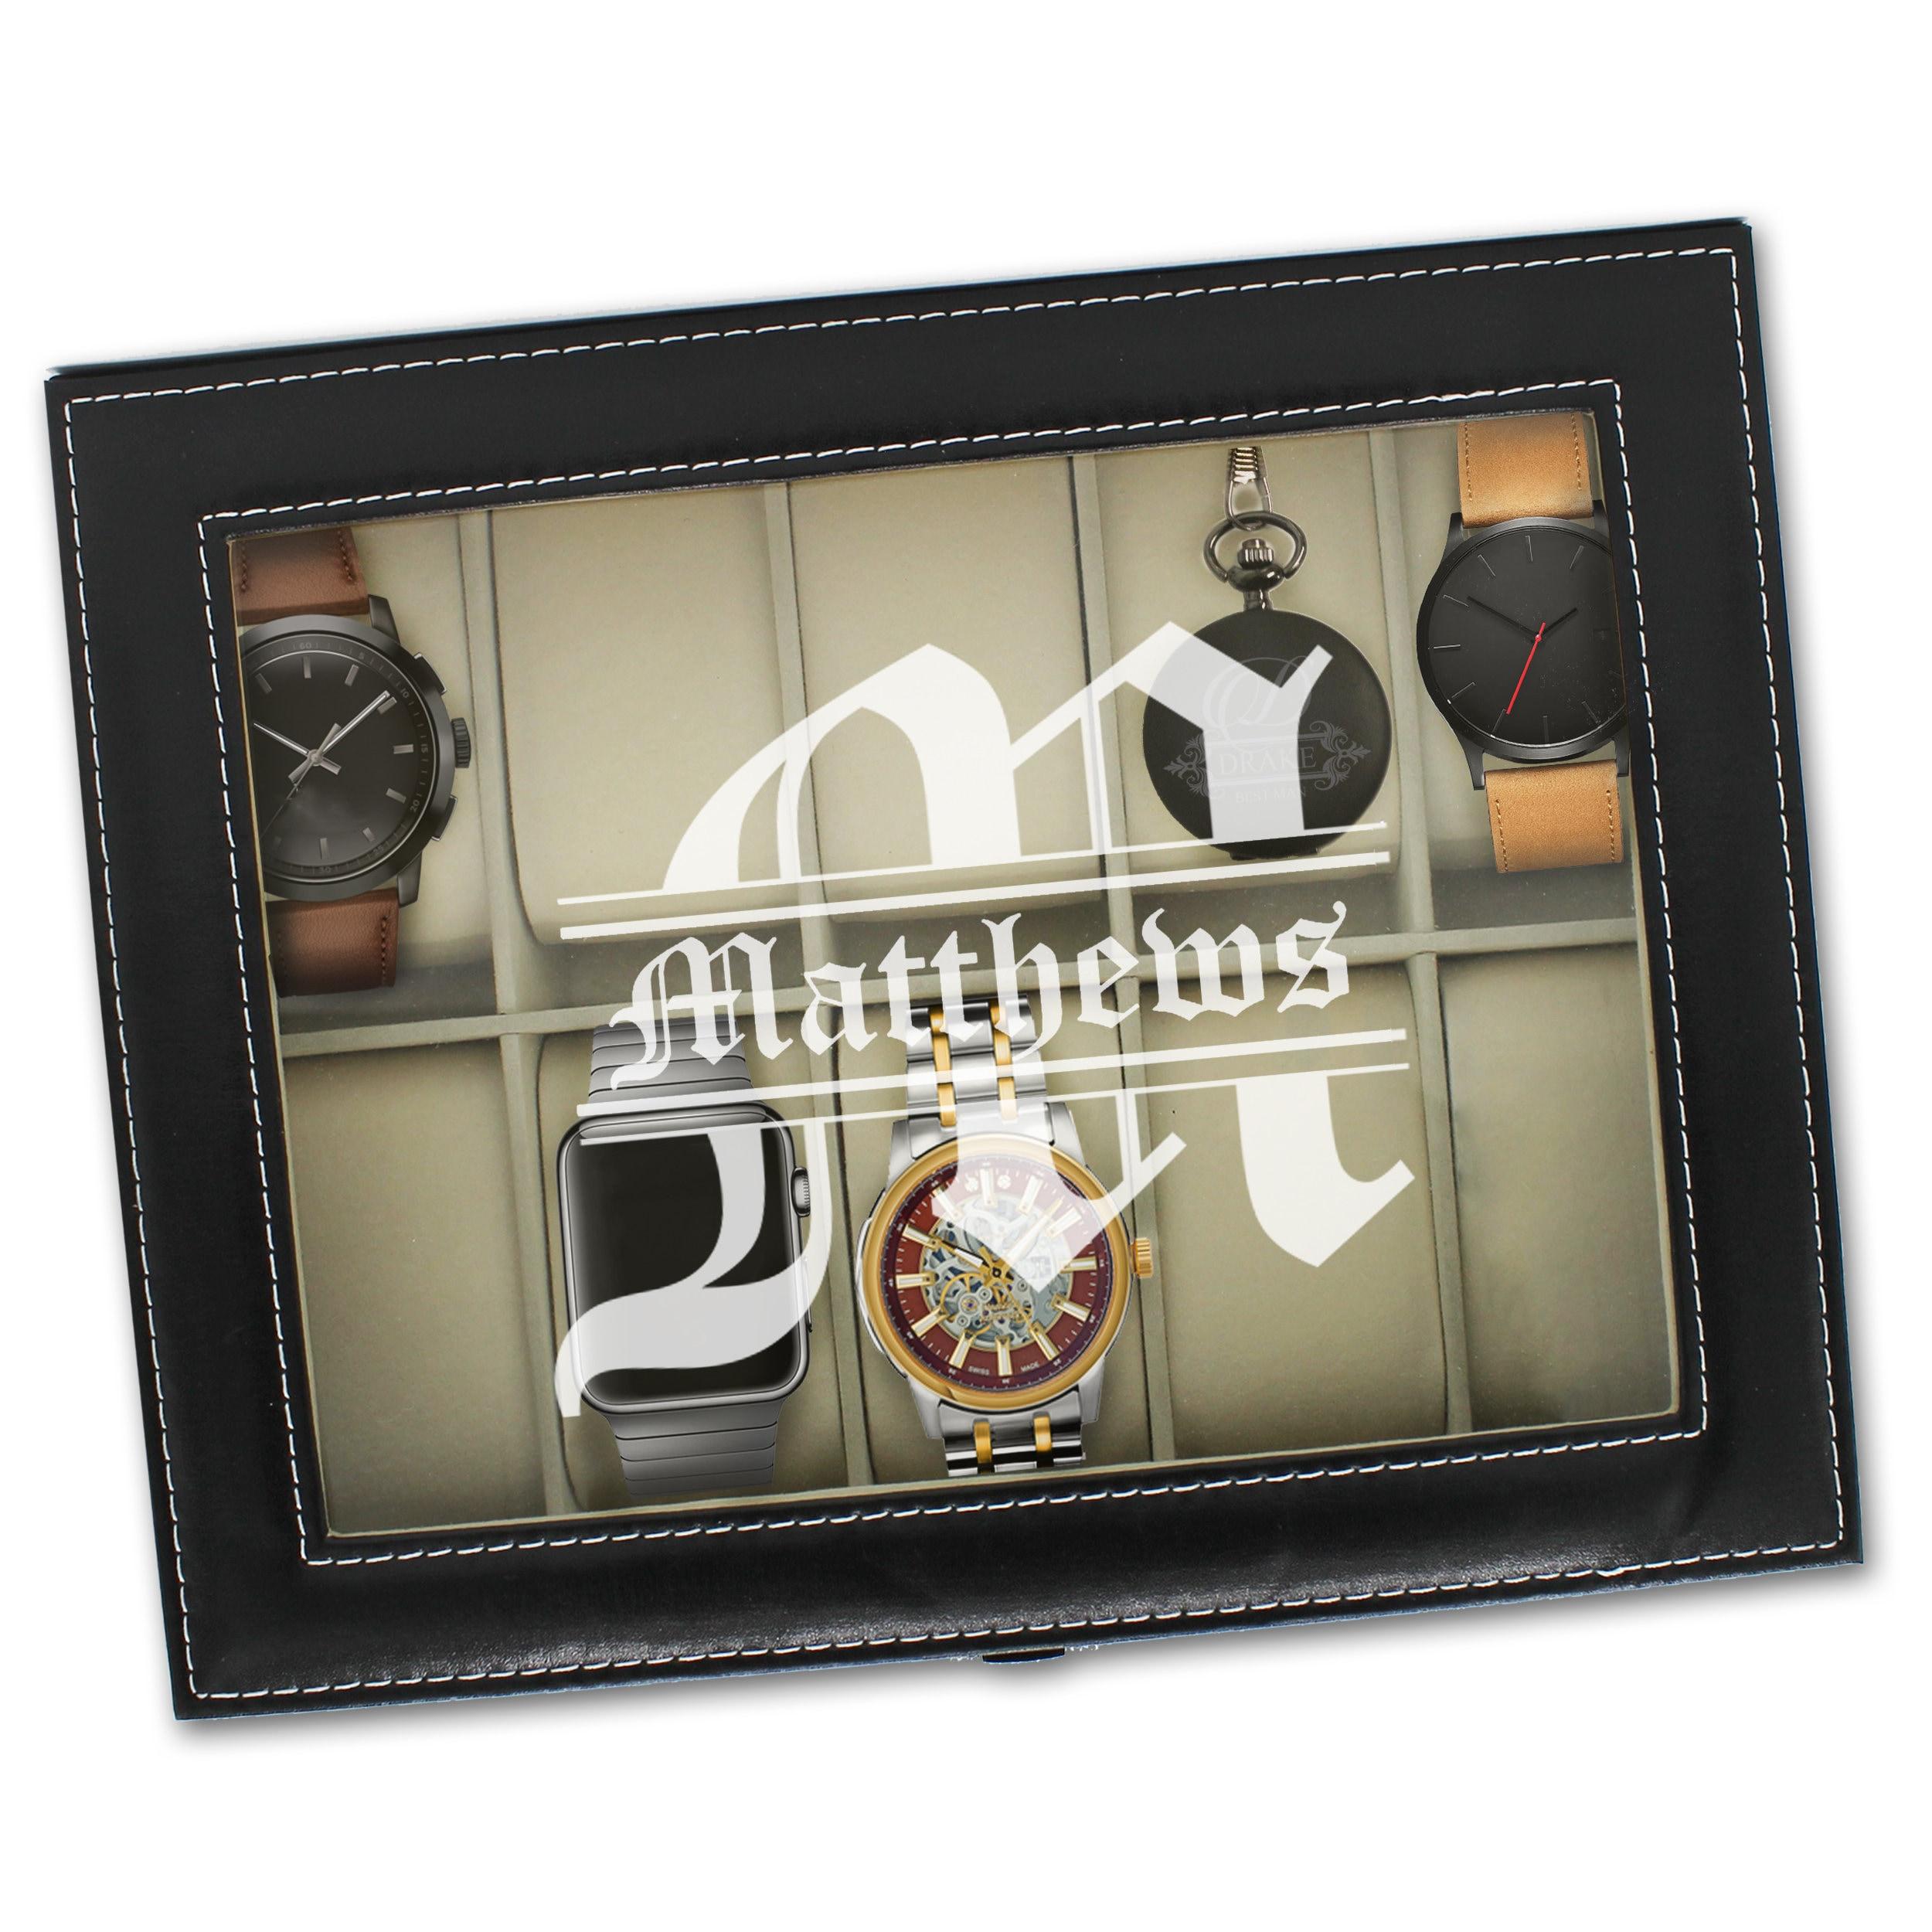 Mens Watch Box, Custom Watch Box, Mens Watch Case, Watch Storage Case, Personalized Watch Case, Watch Box for Men, Leather Watch Box